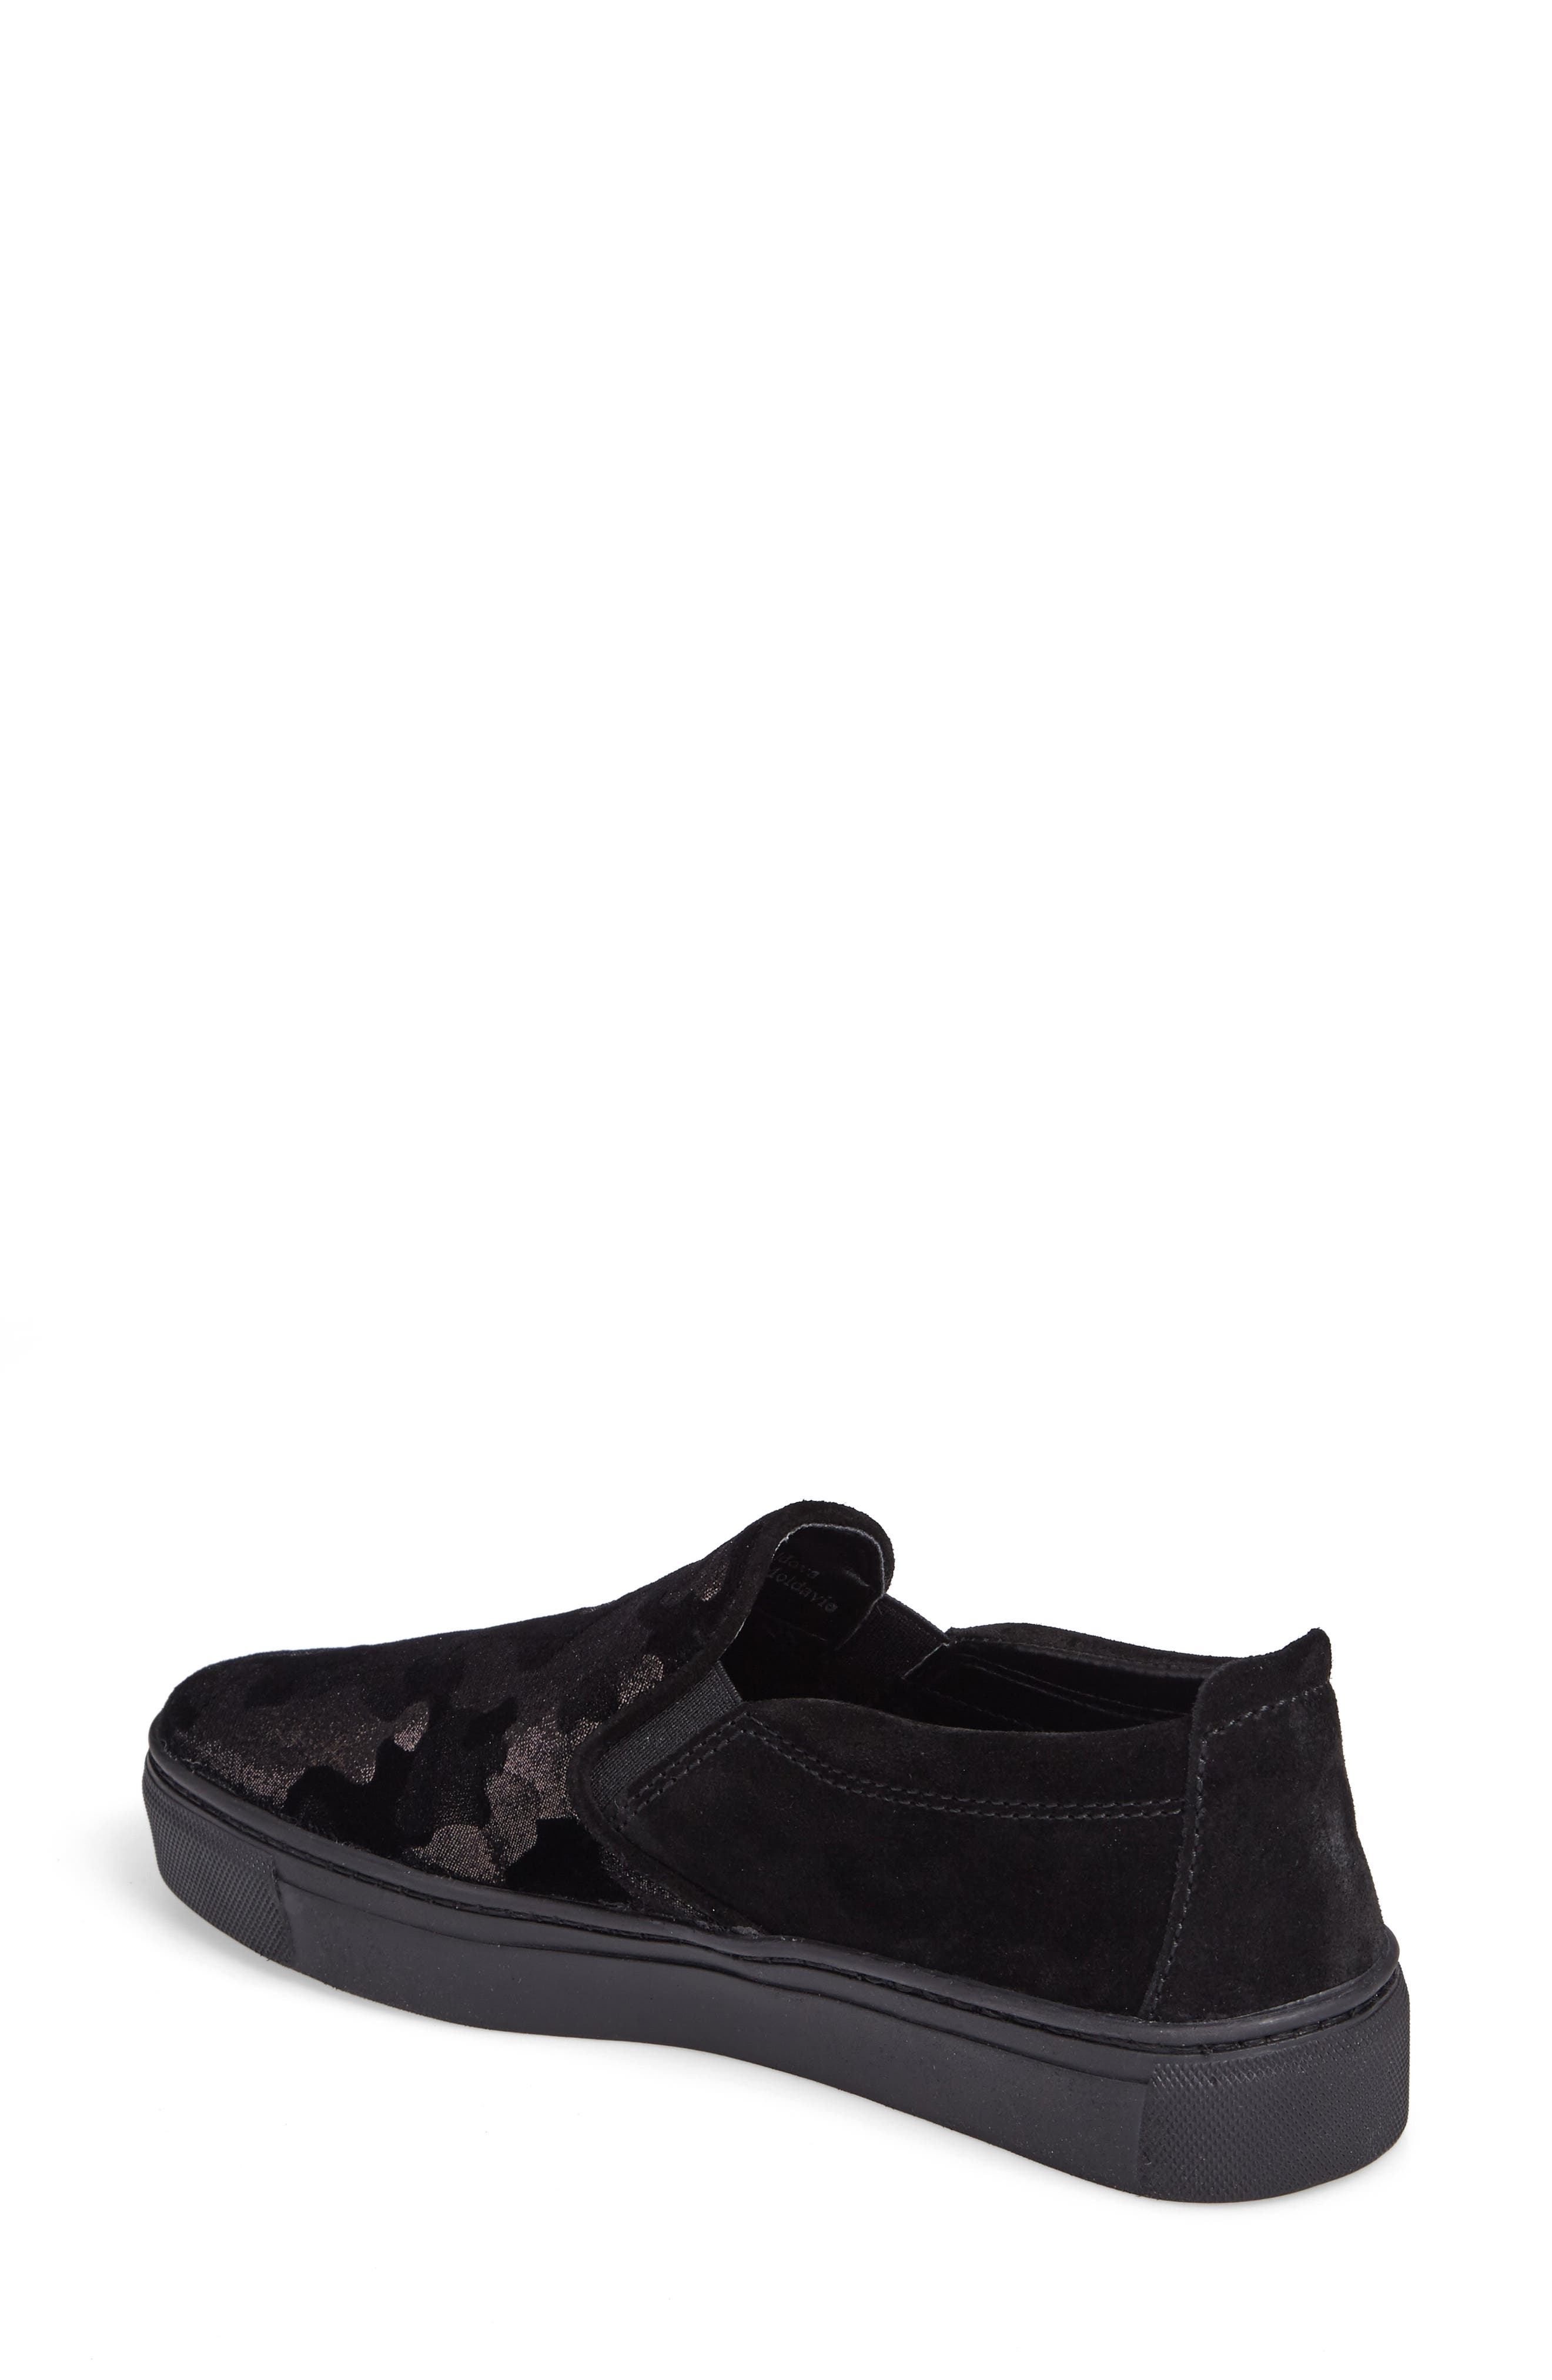 Full Time Sneaker,                             Alternate thumbnail 2, color,                             BLACK SUEDE